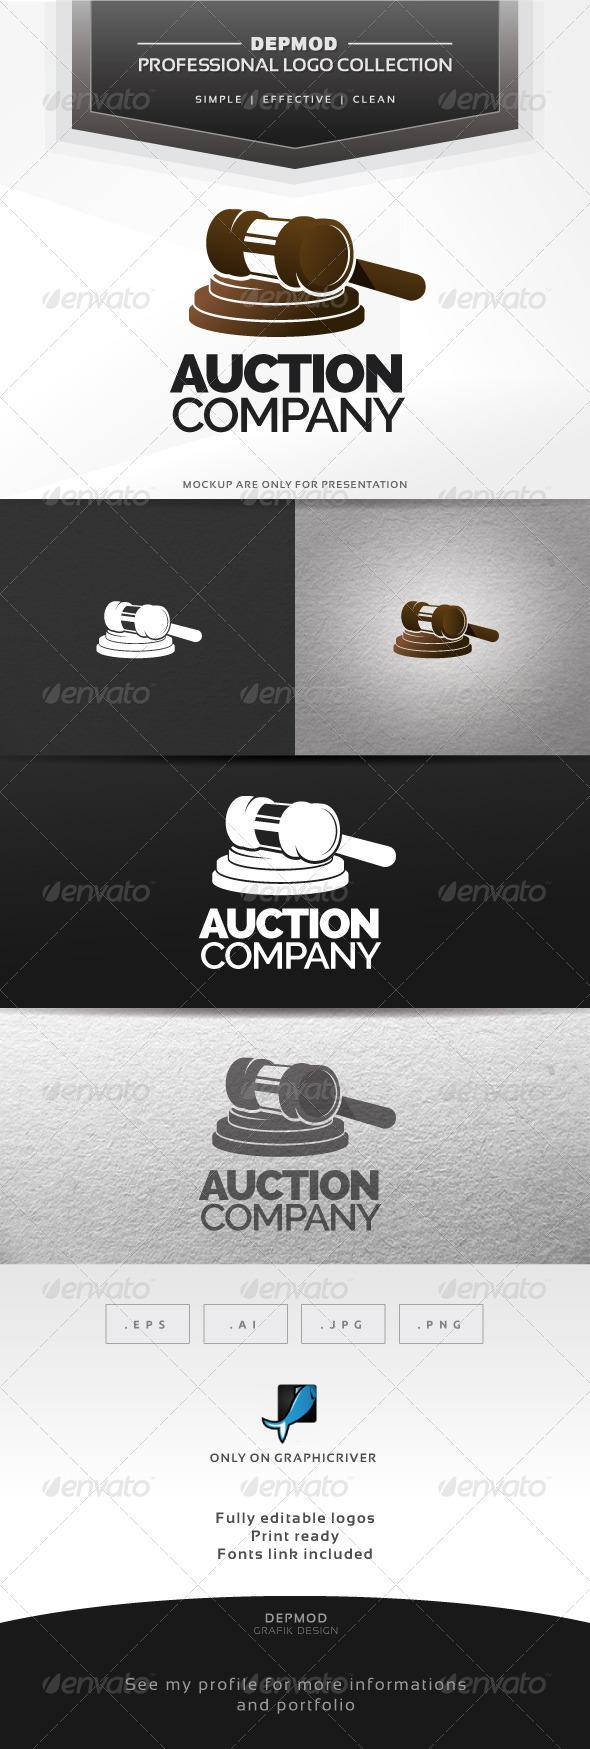 GraphicRiver Auction Company Logo 6743363